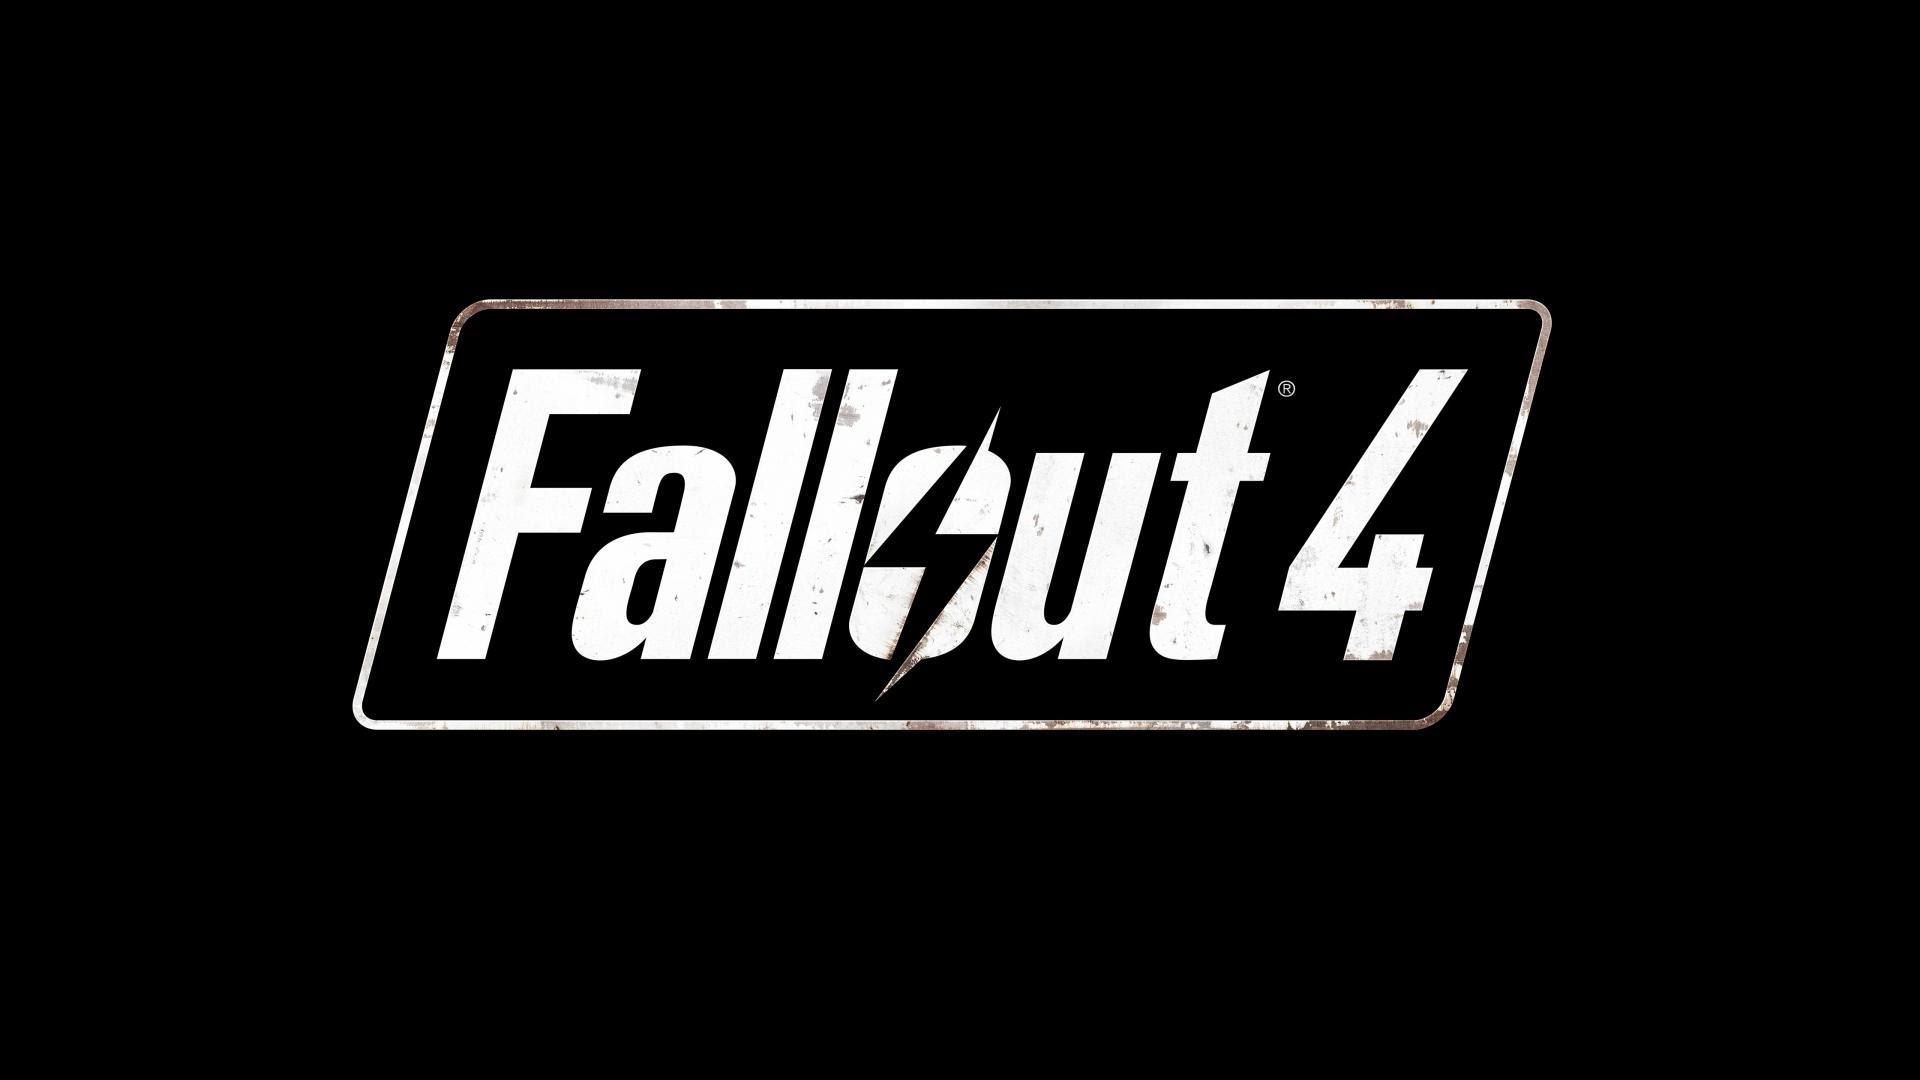 1920x1080 Fallout 4